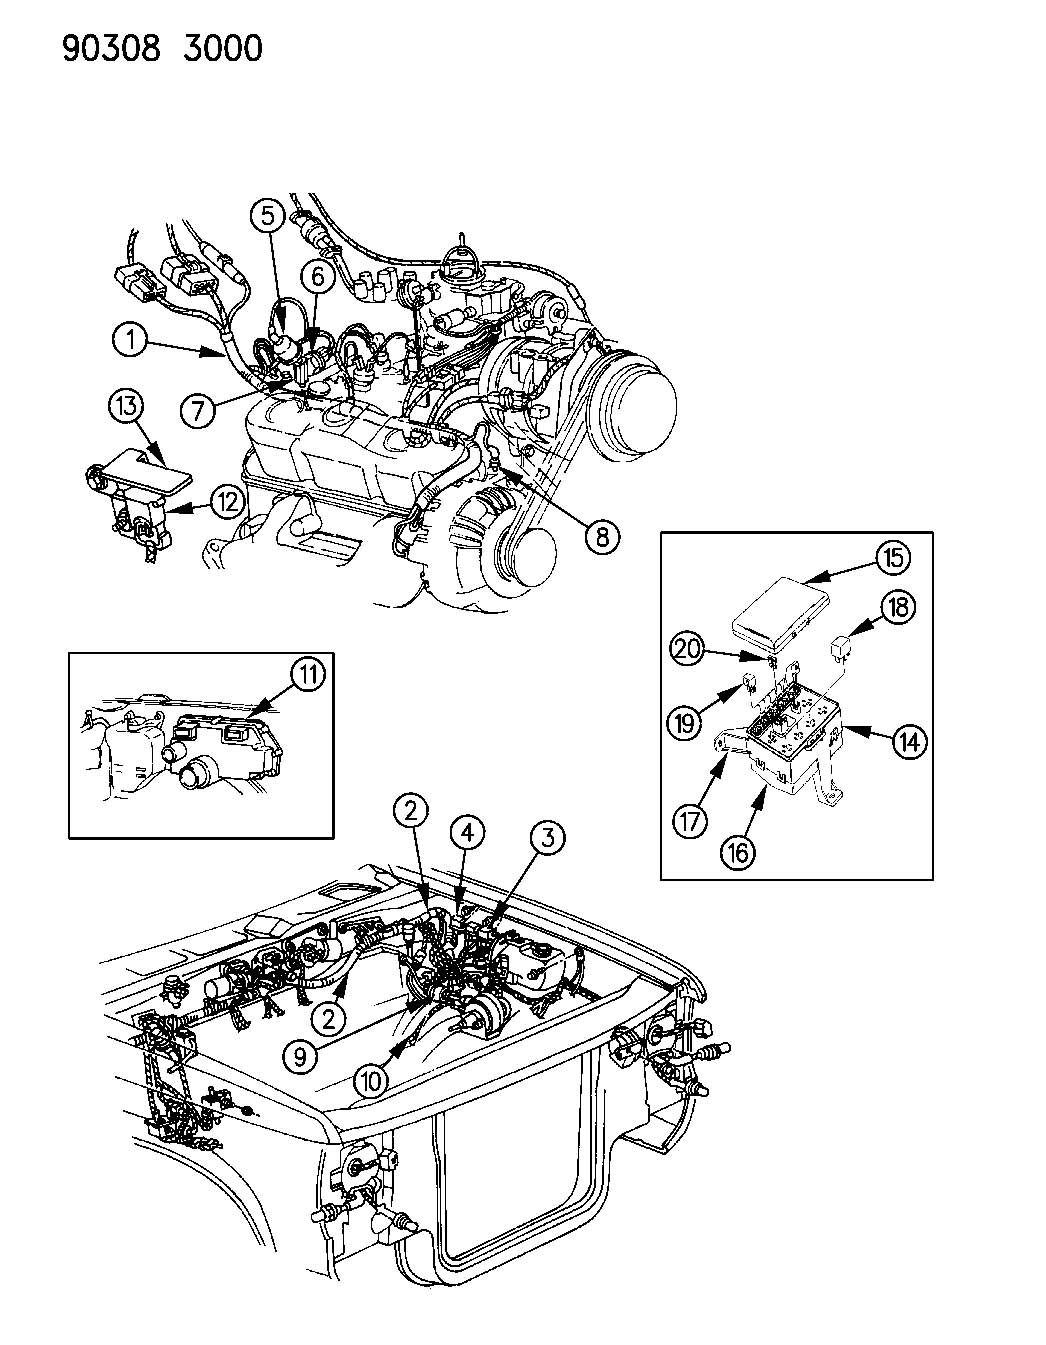 Dodge Durango Cartridge. Fuseable link. 30 amp, pink